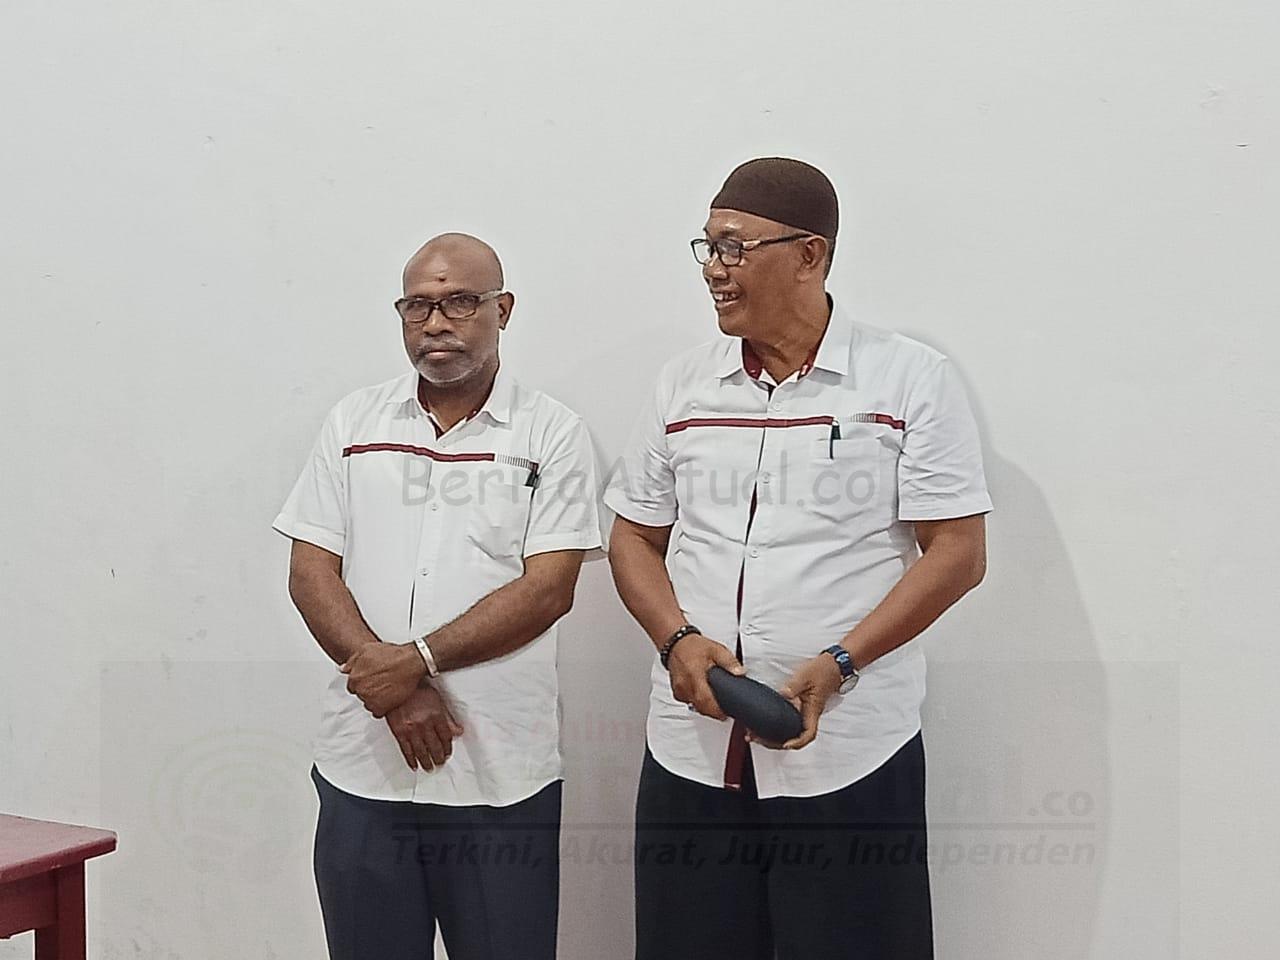 Saat Daftar di KPU, Kedatangan Boneftar - Waluyo Akan Disambut Tarian Nusantara 1 IMG 20200903 WA0032